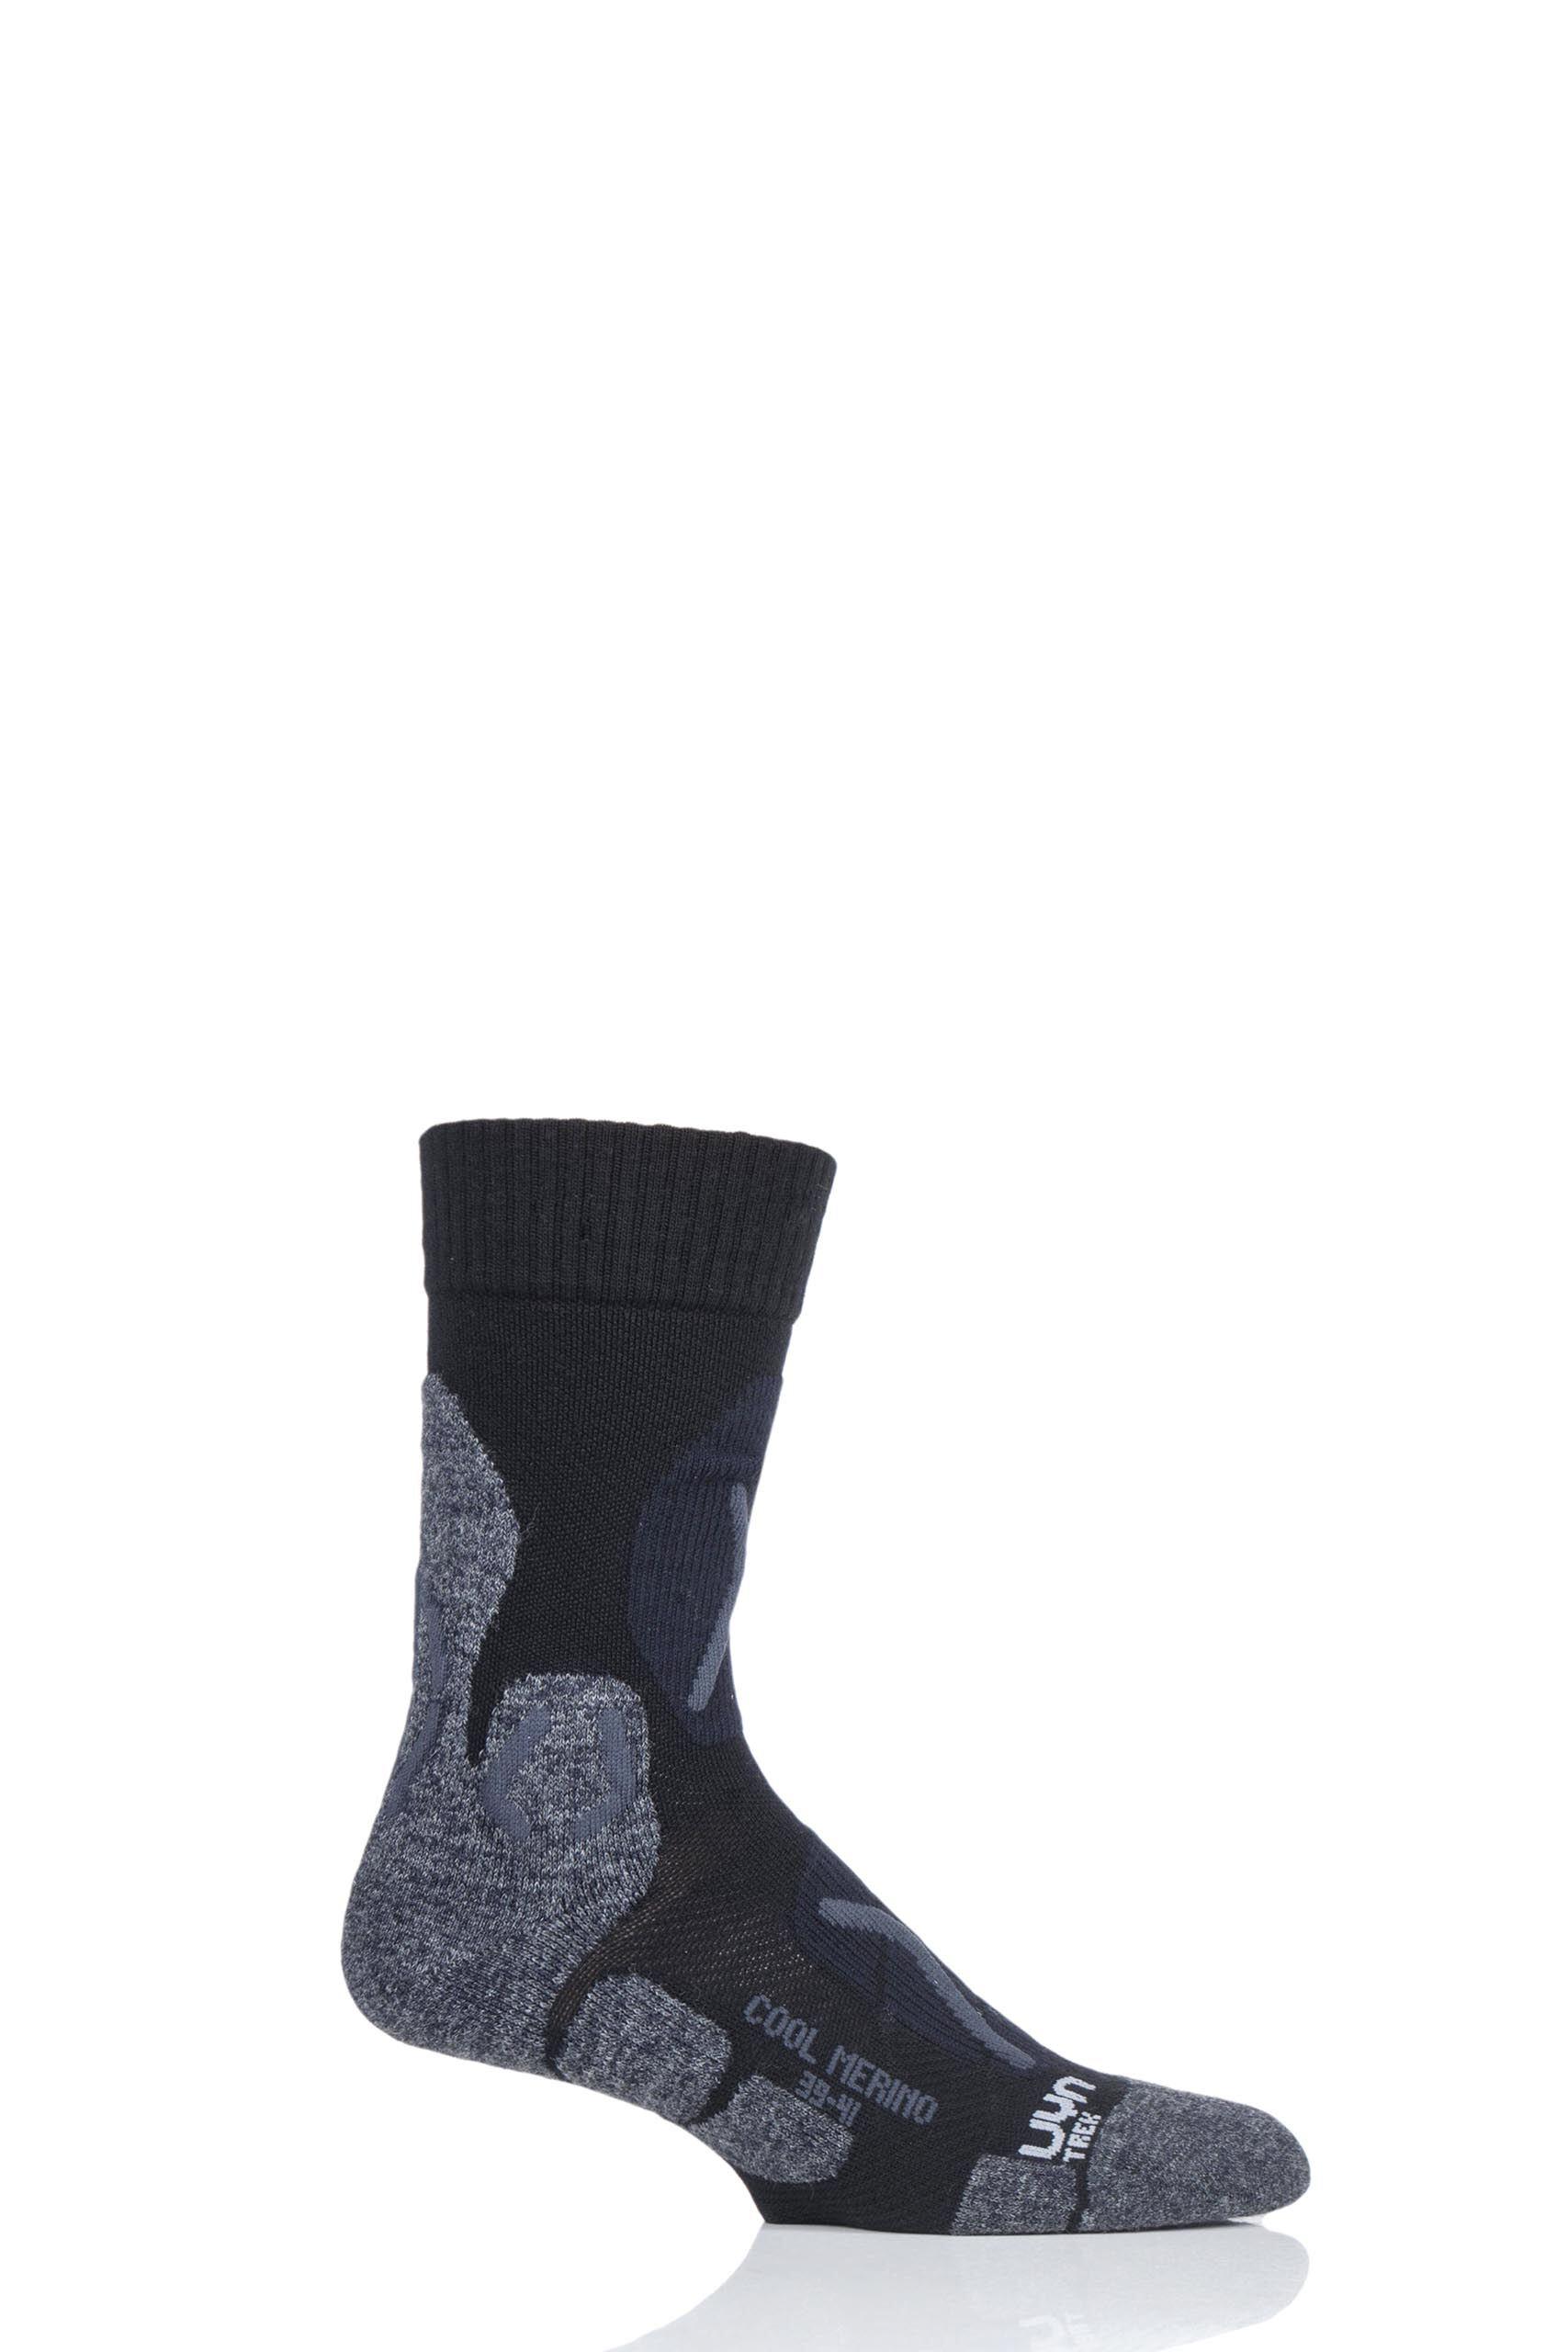 Image of 1 Pair Black Cool Merino Trekking Socks Men's 10-12 Mens - UYN